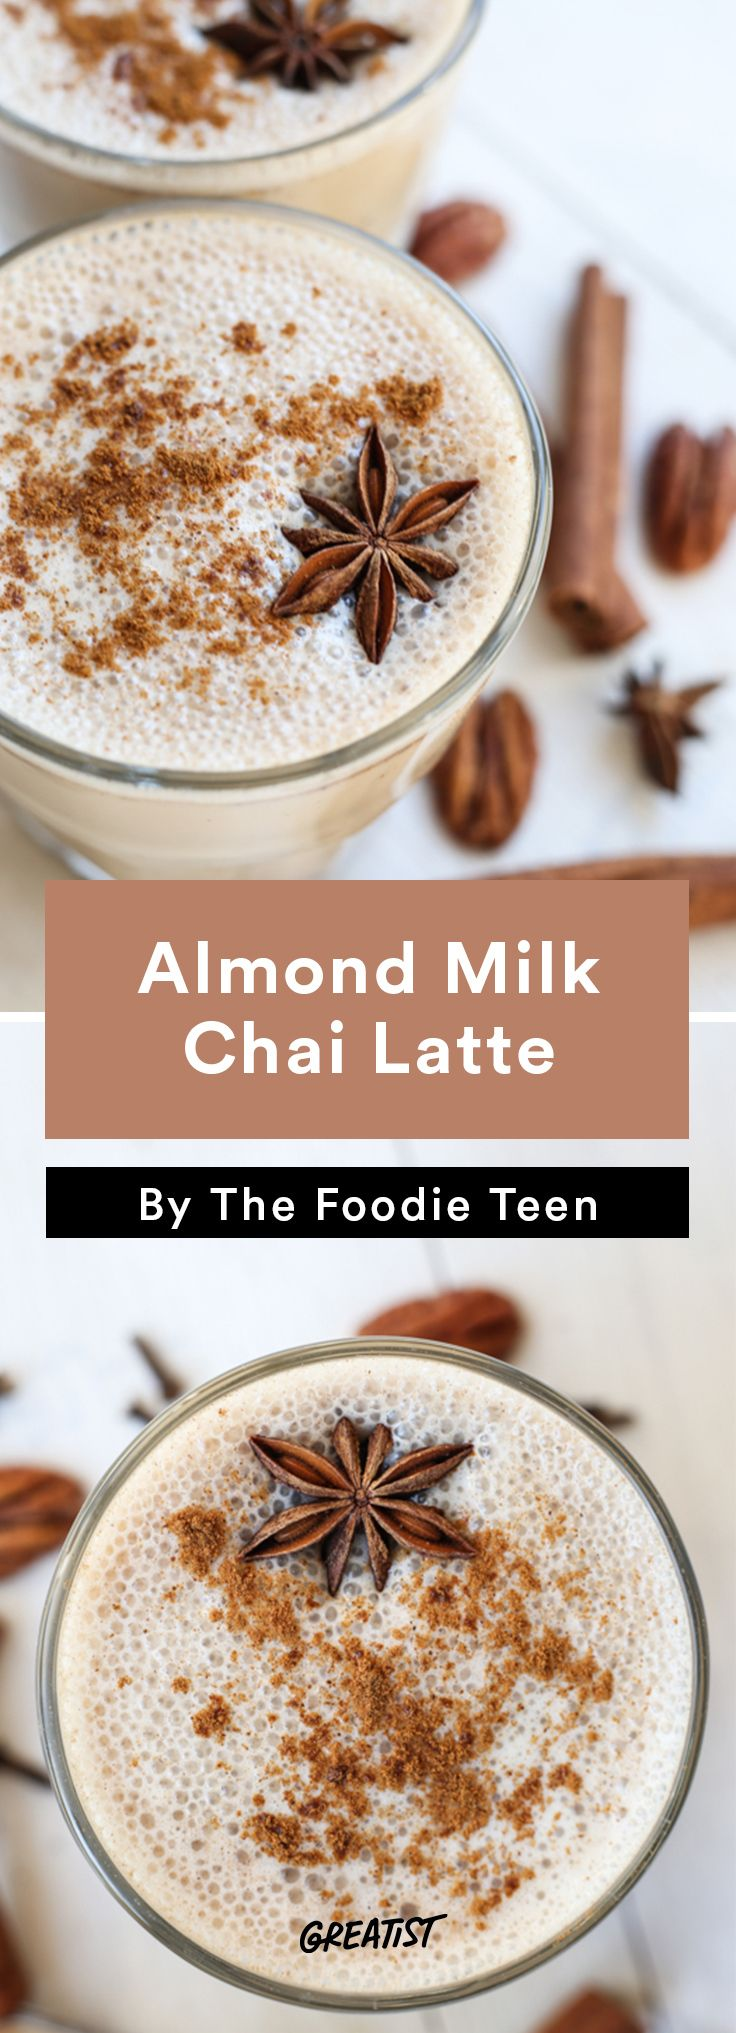 3. Almond Milk Chai Latte #warm #drinks #recipes http://greatist.com/eat/warm-drink-recipes-better-than-a-pumpkin-spice-latte